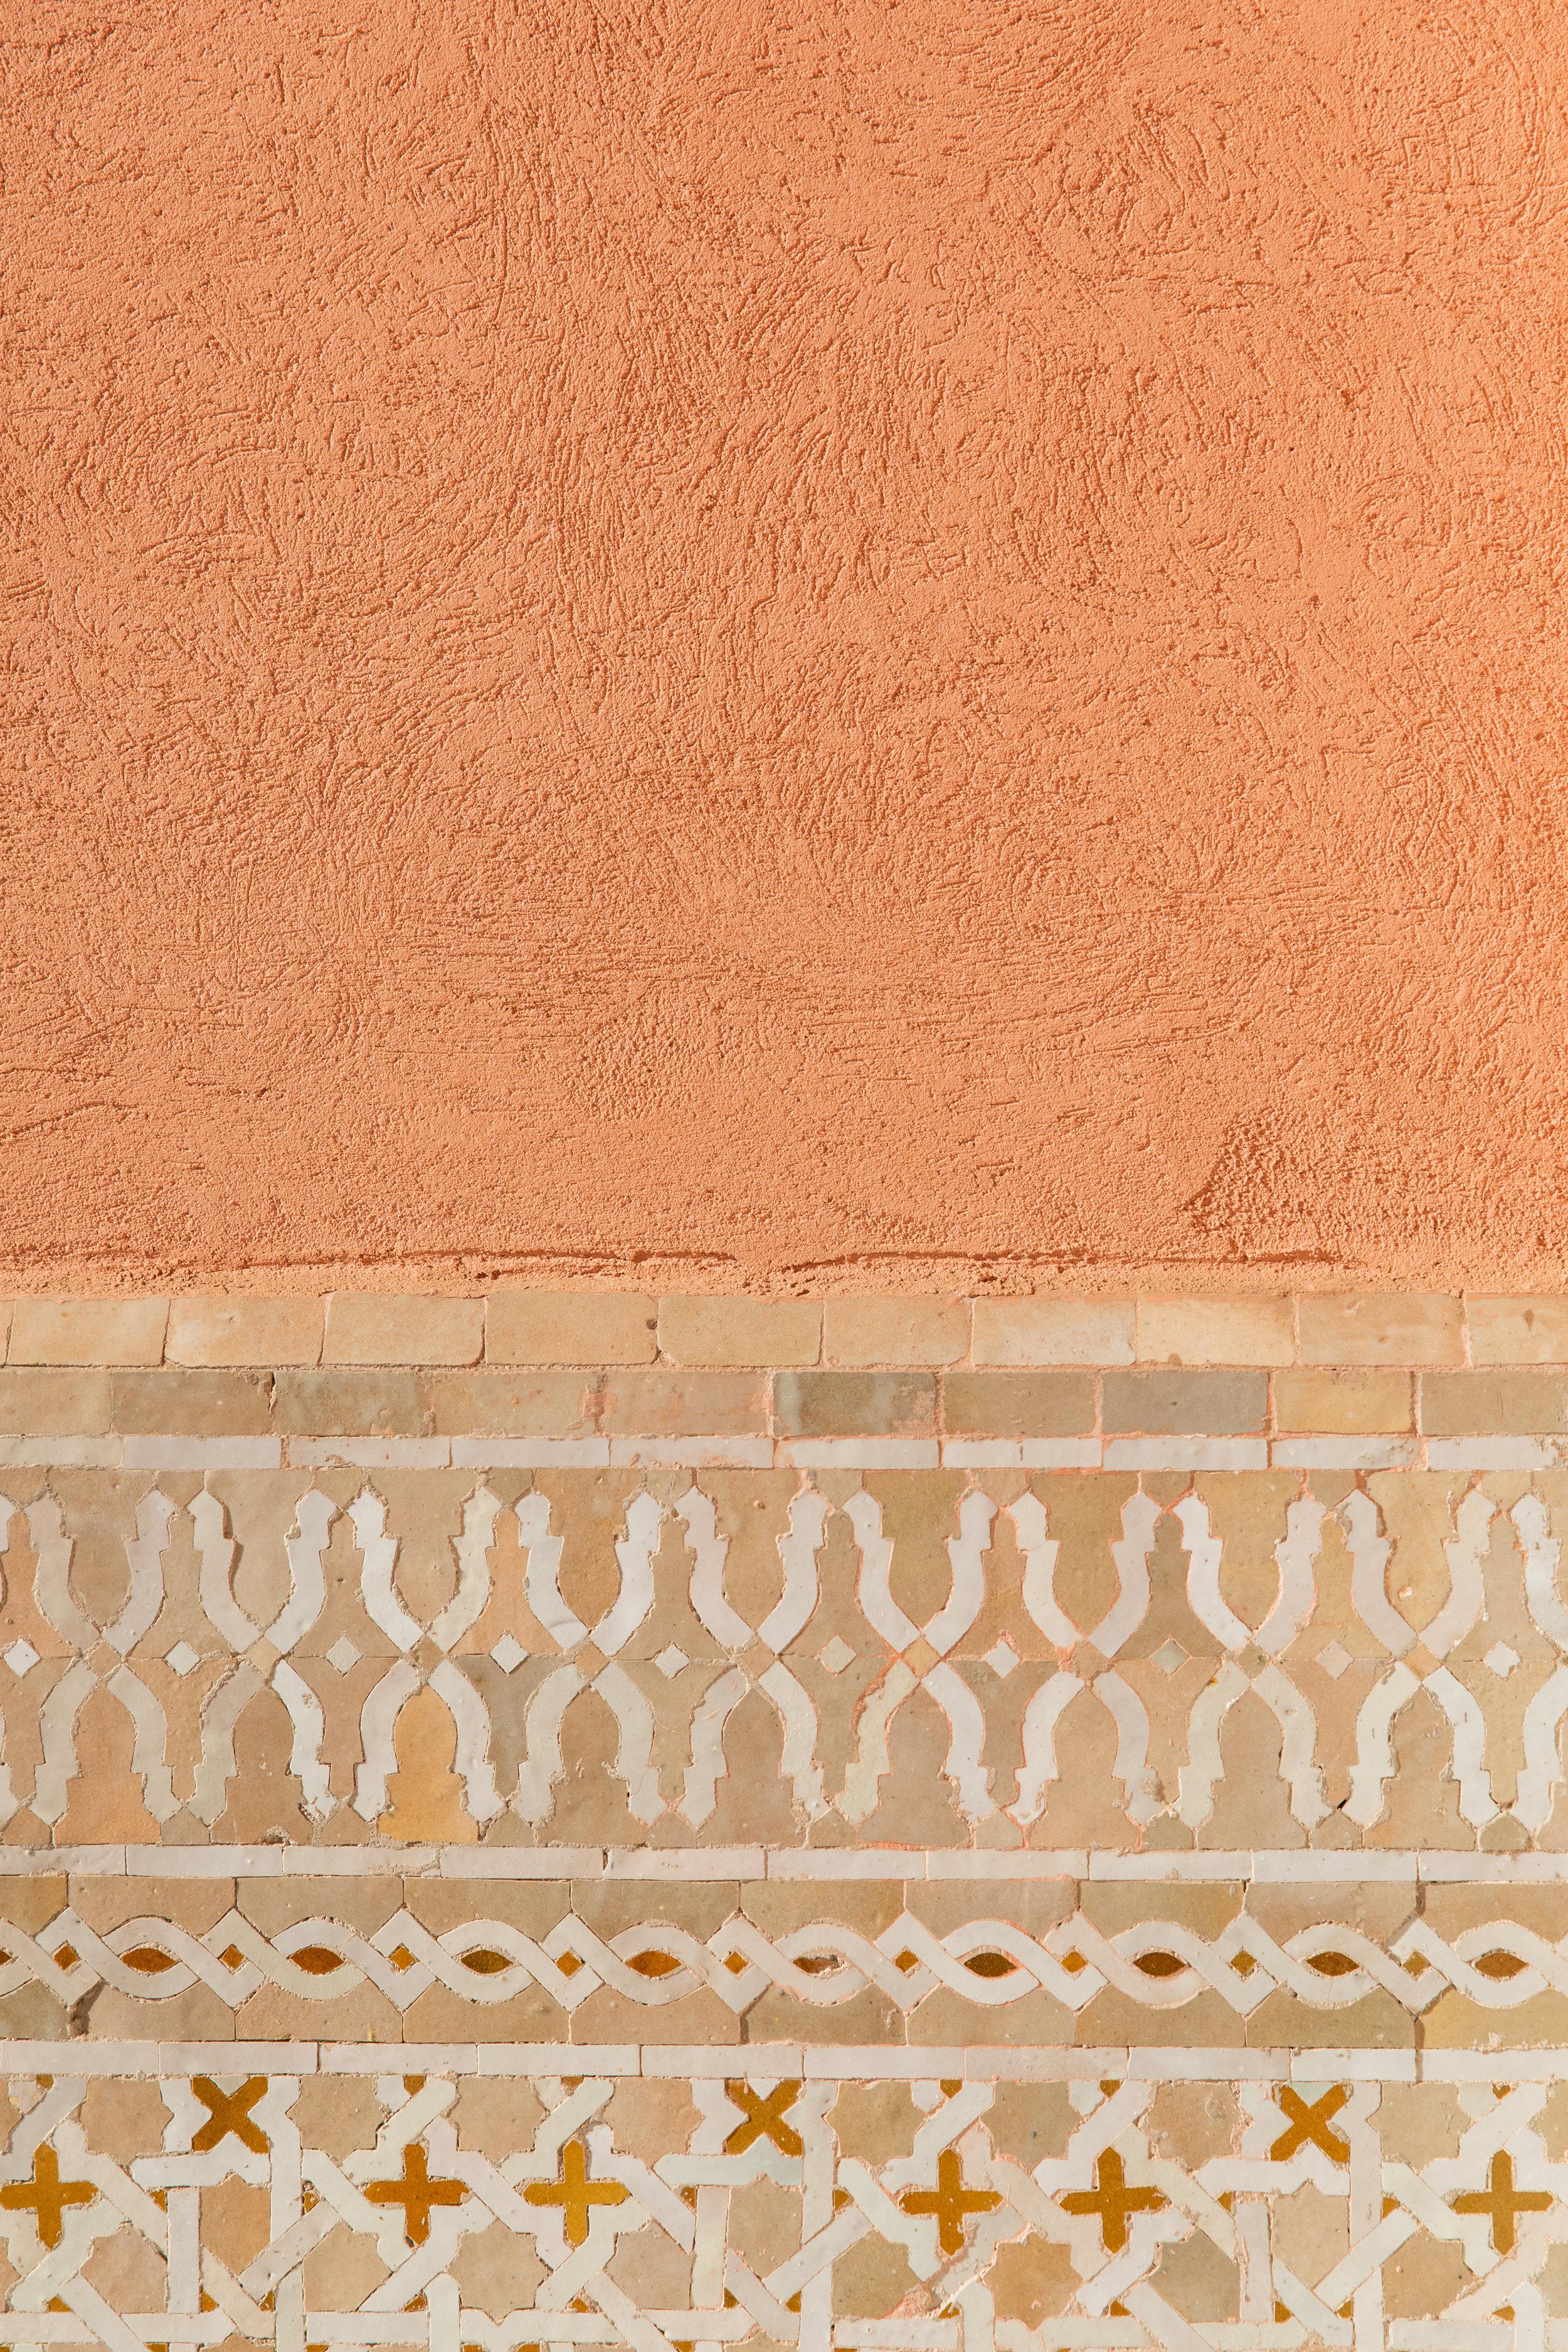 Morocco-3659.jpg